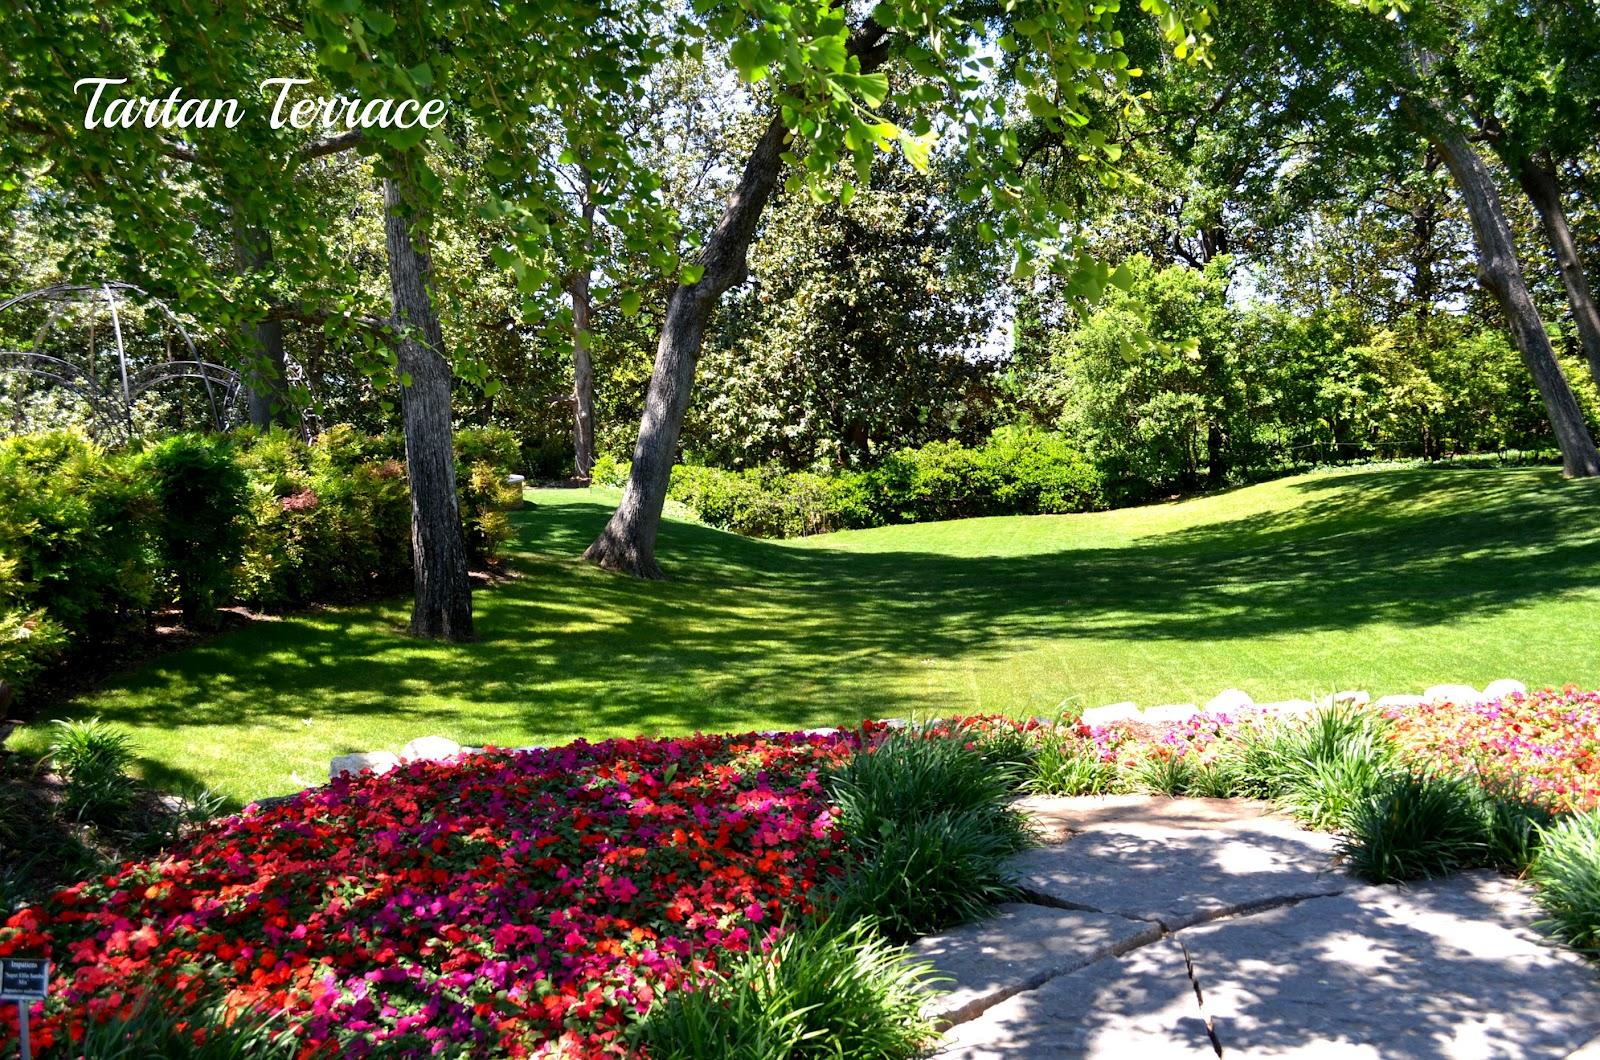 Tartanterrace Pretty Gardens